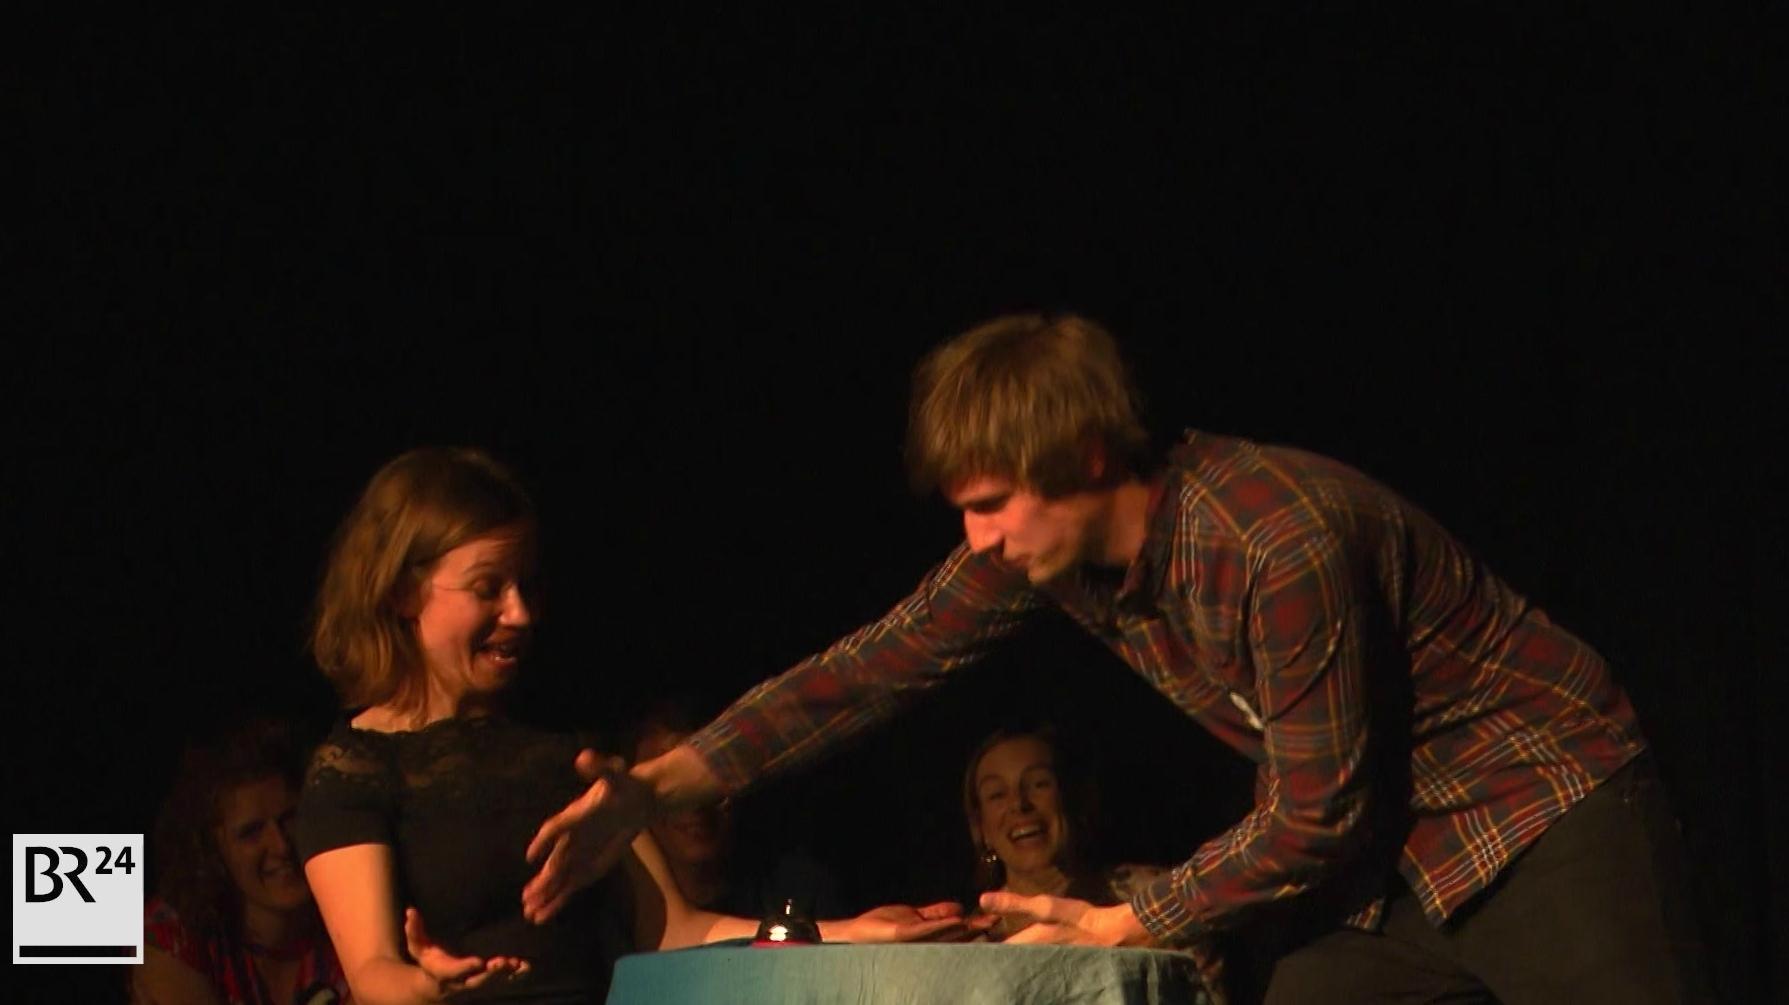 17. Improtheaterfestival in Würzburg